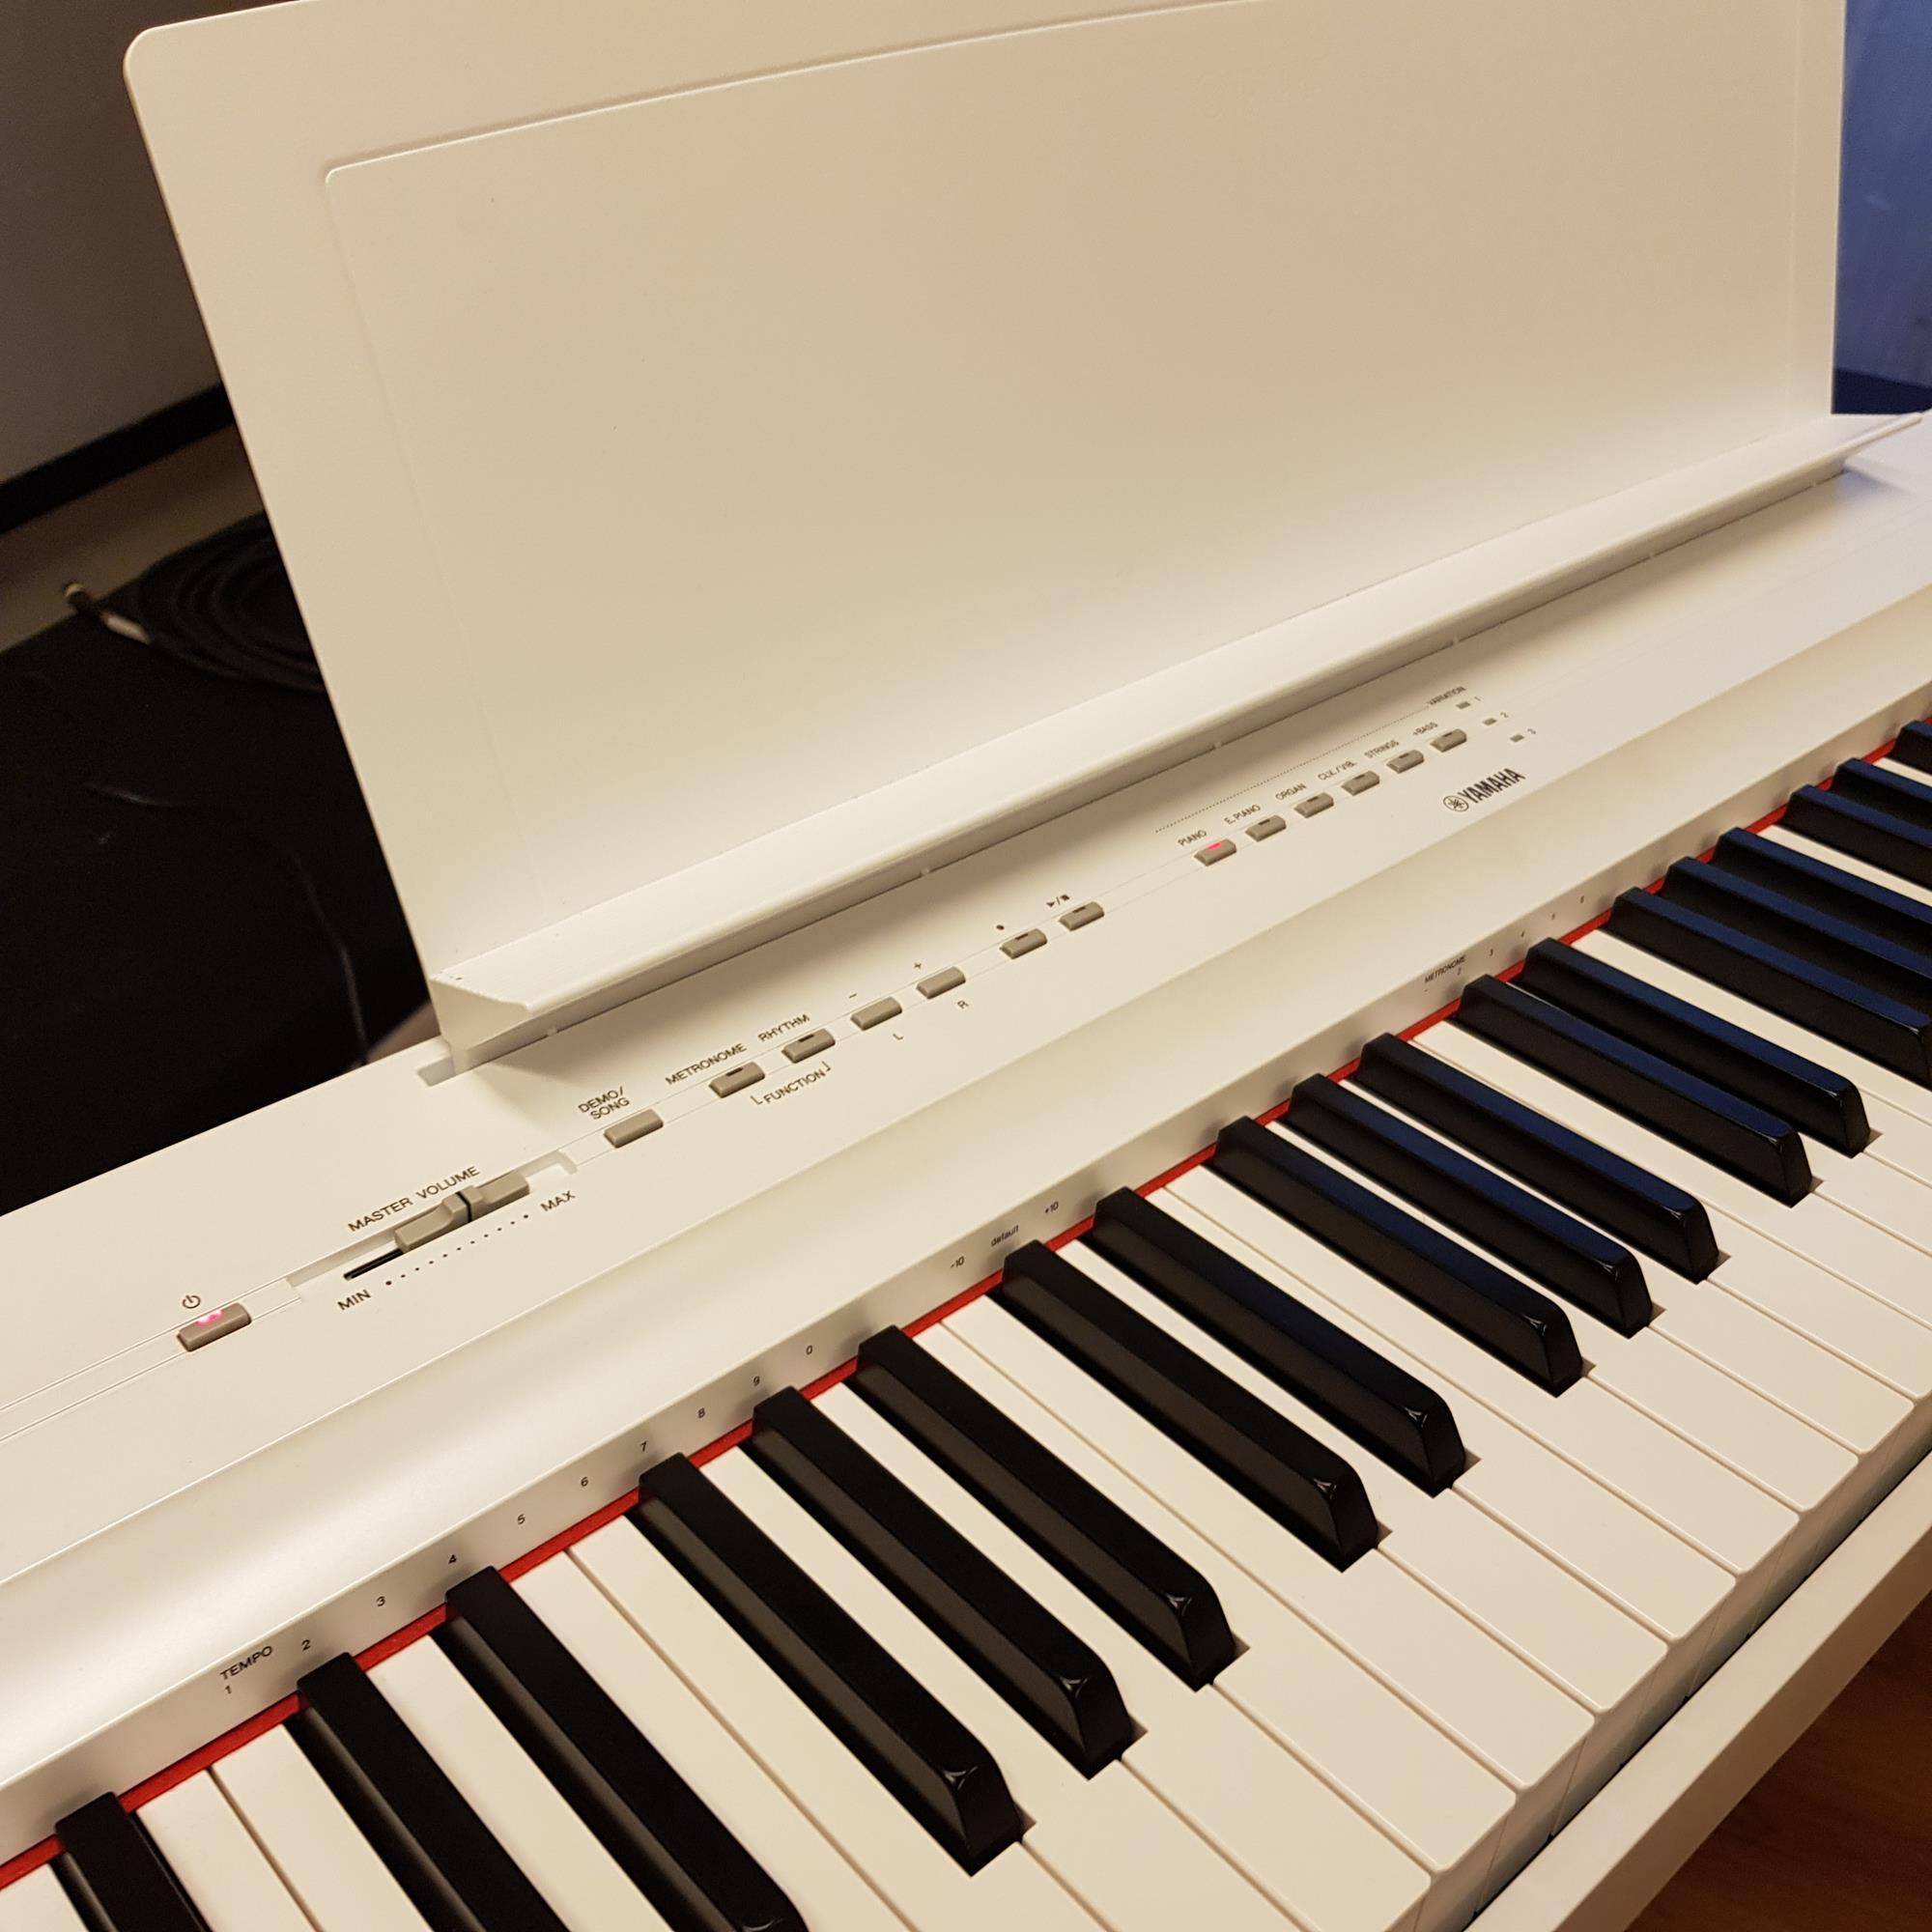 YAMAHA-P125-WHITE-PIANO-L125-STAND-WHITE-LP1-WHITE-PEDAL-UNIT-sku-1622890718790